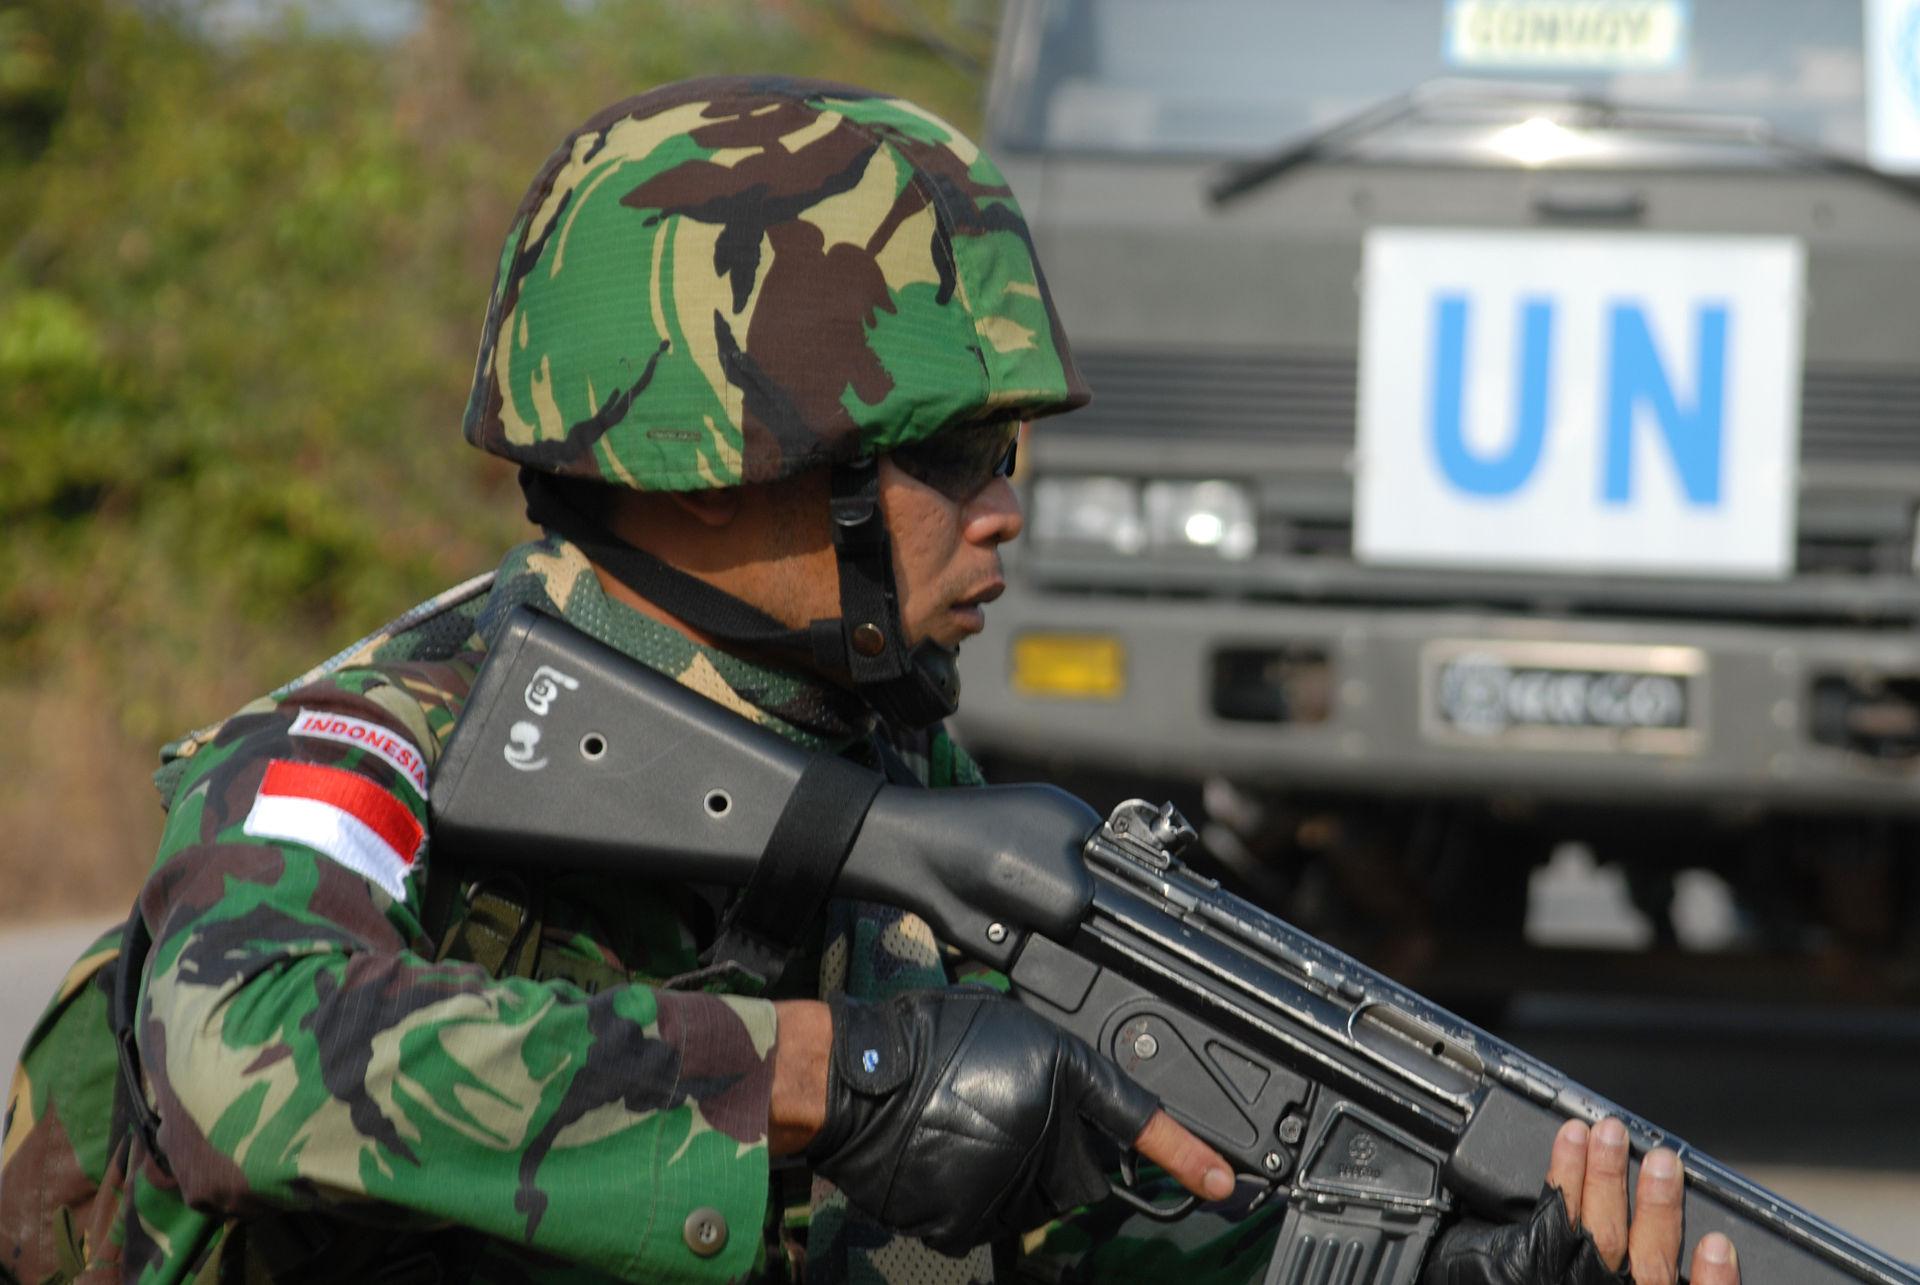 HK93 in Balkan war 91-95?-indone.jpg